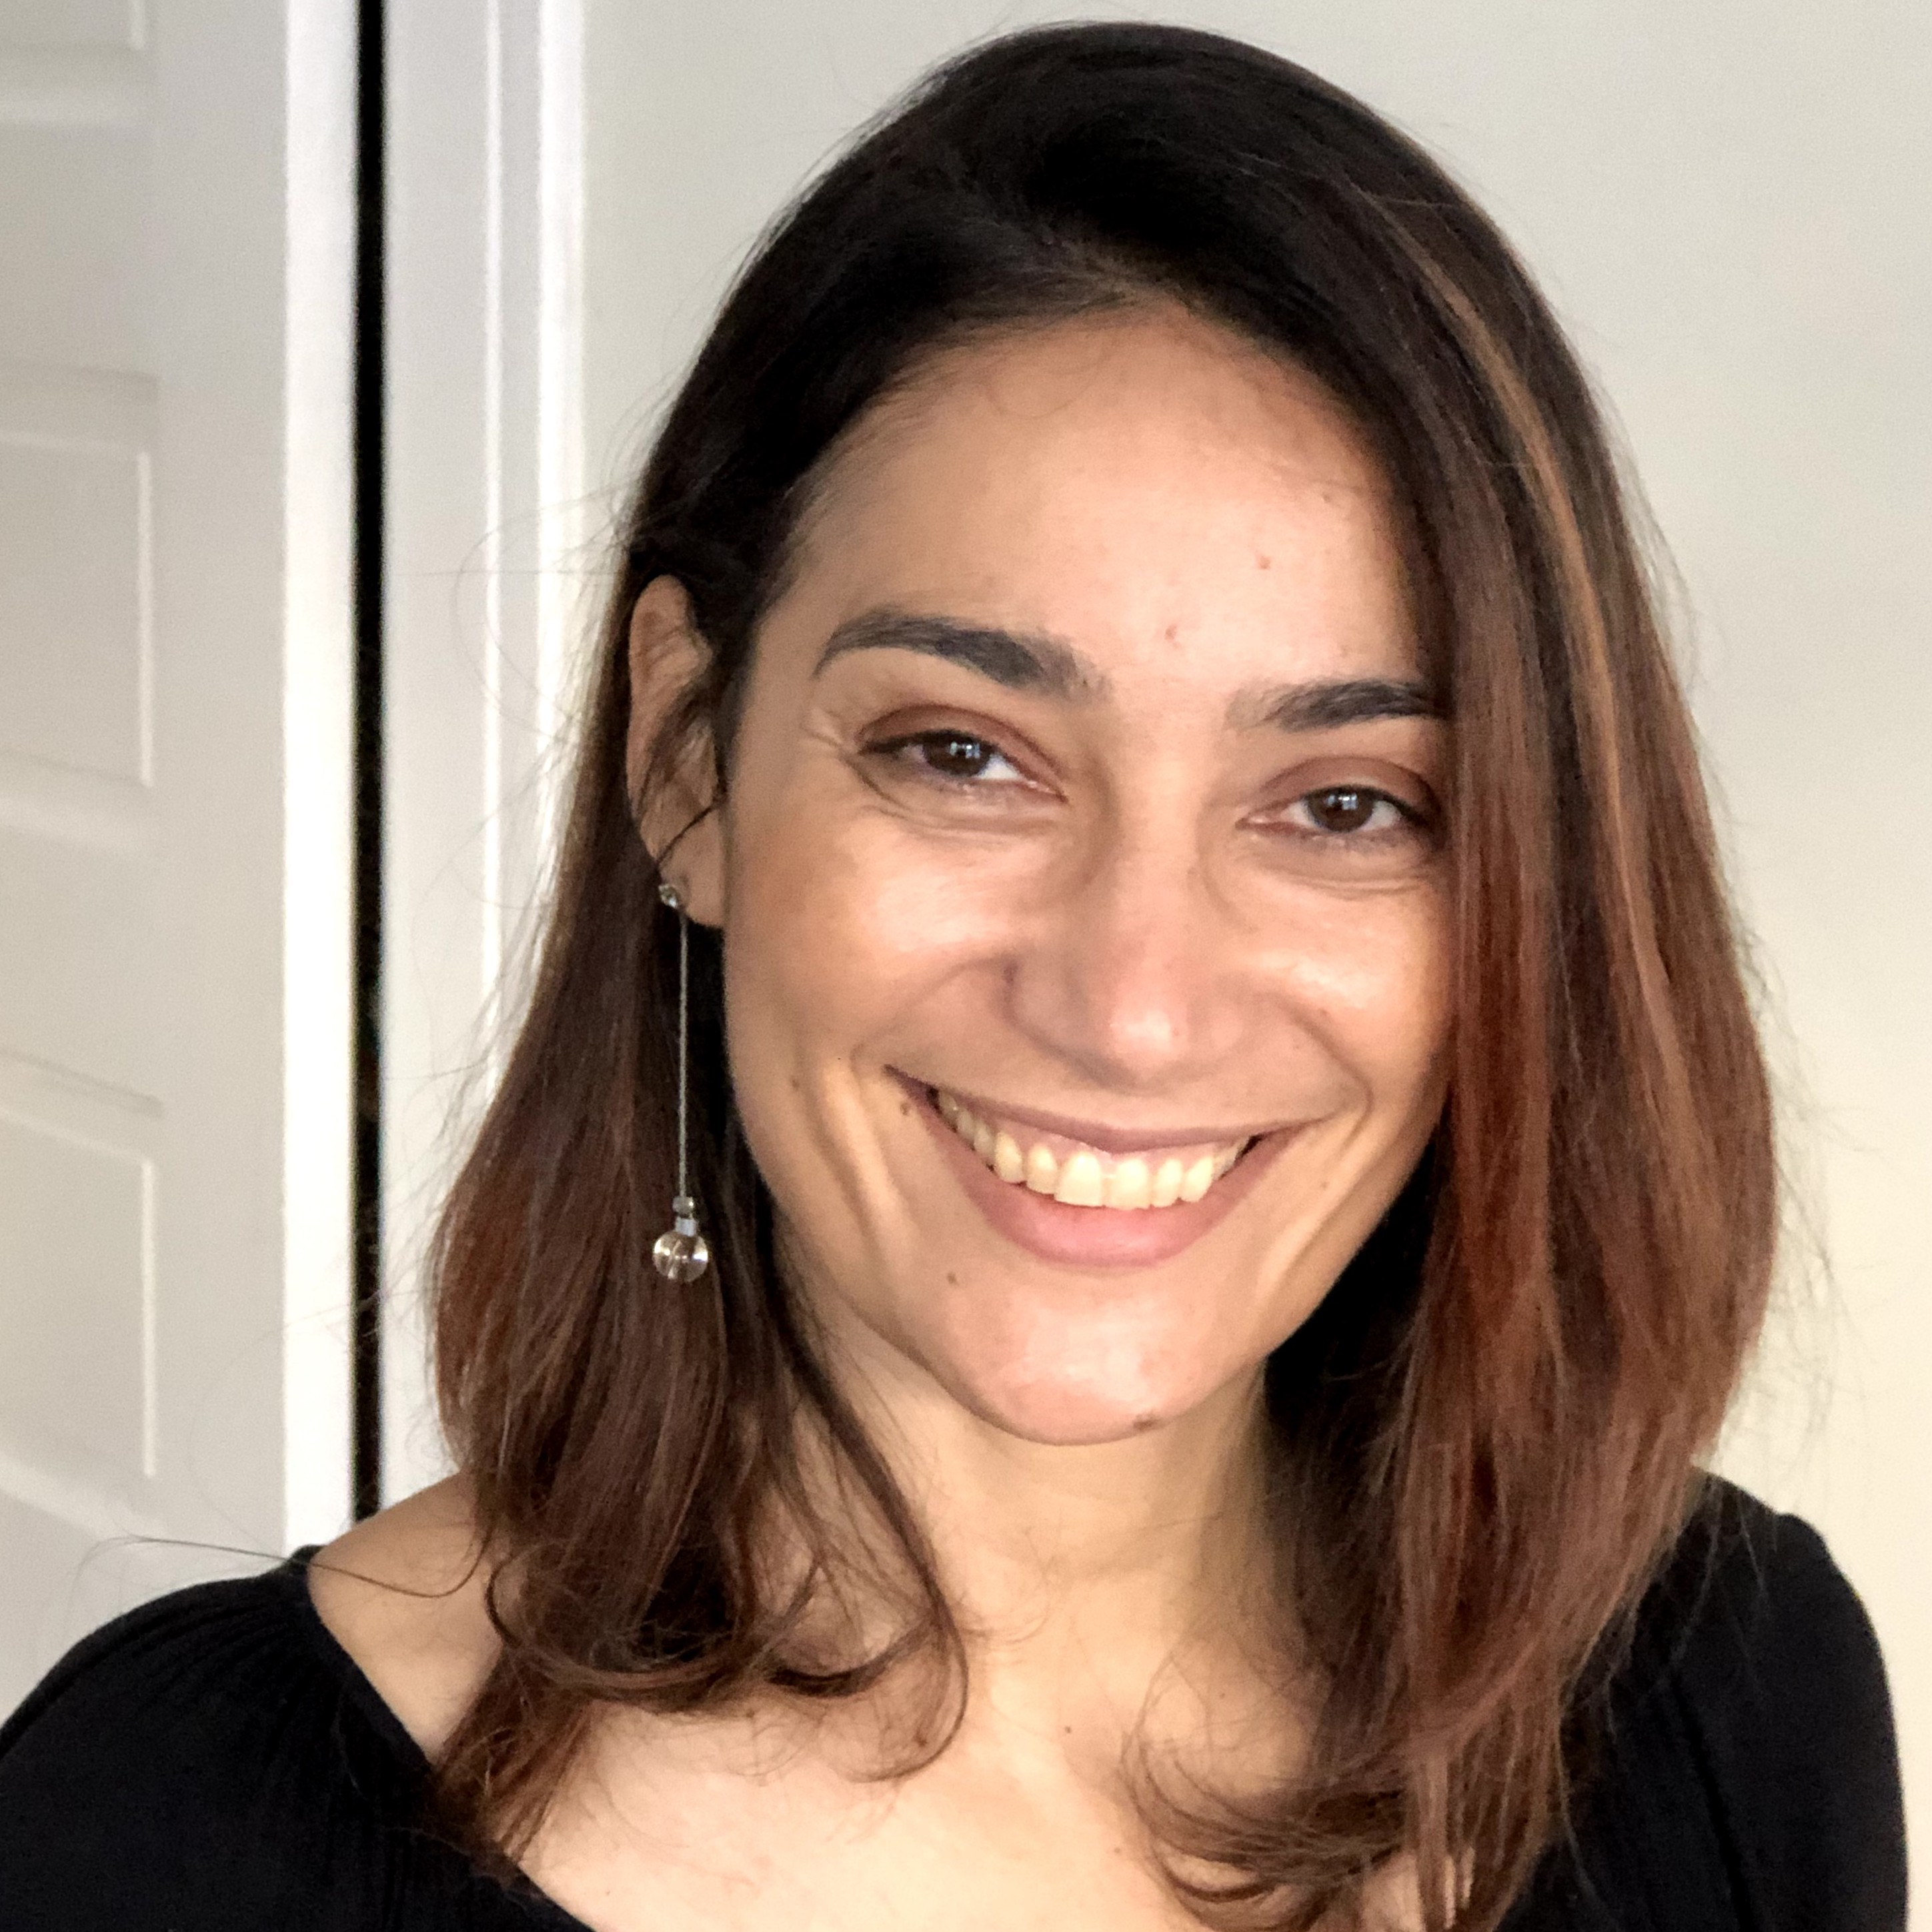 Letania Ferreira